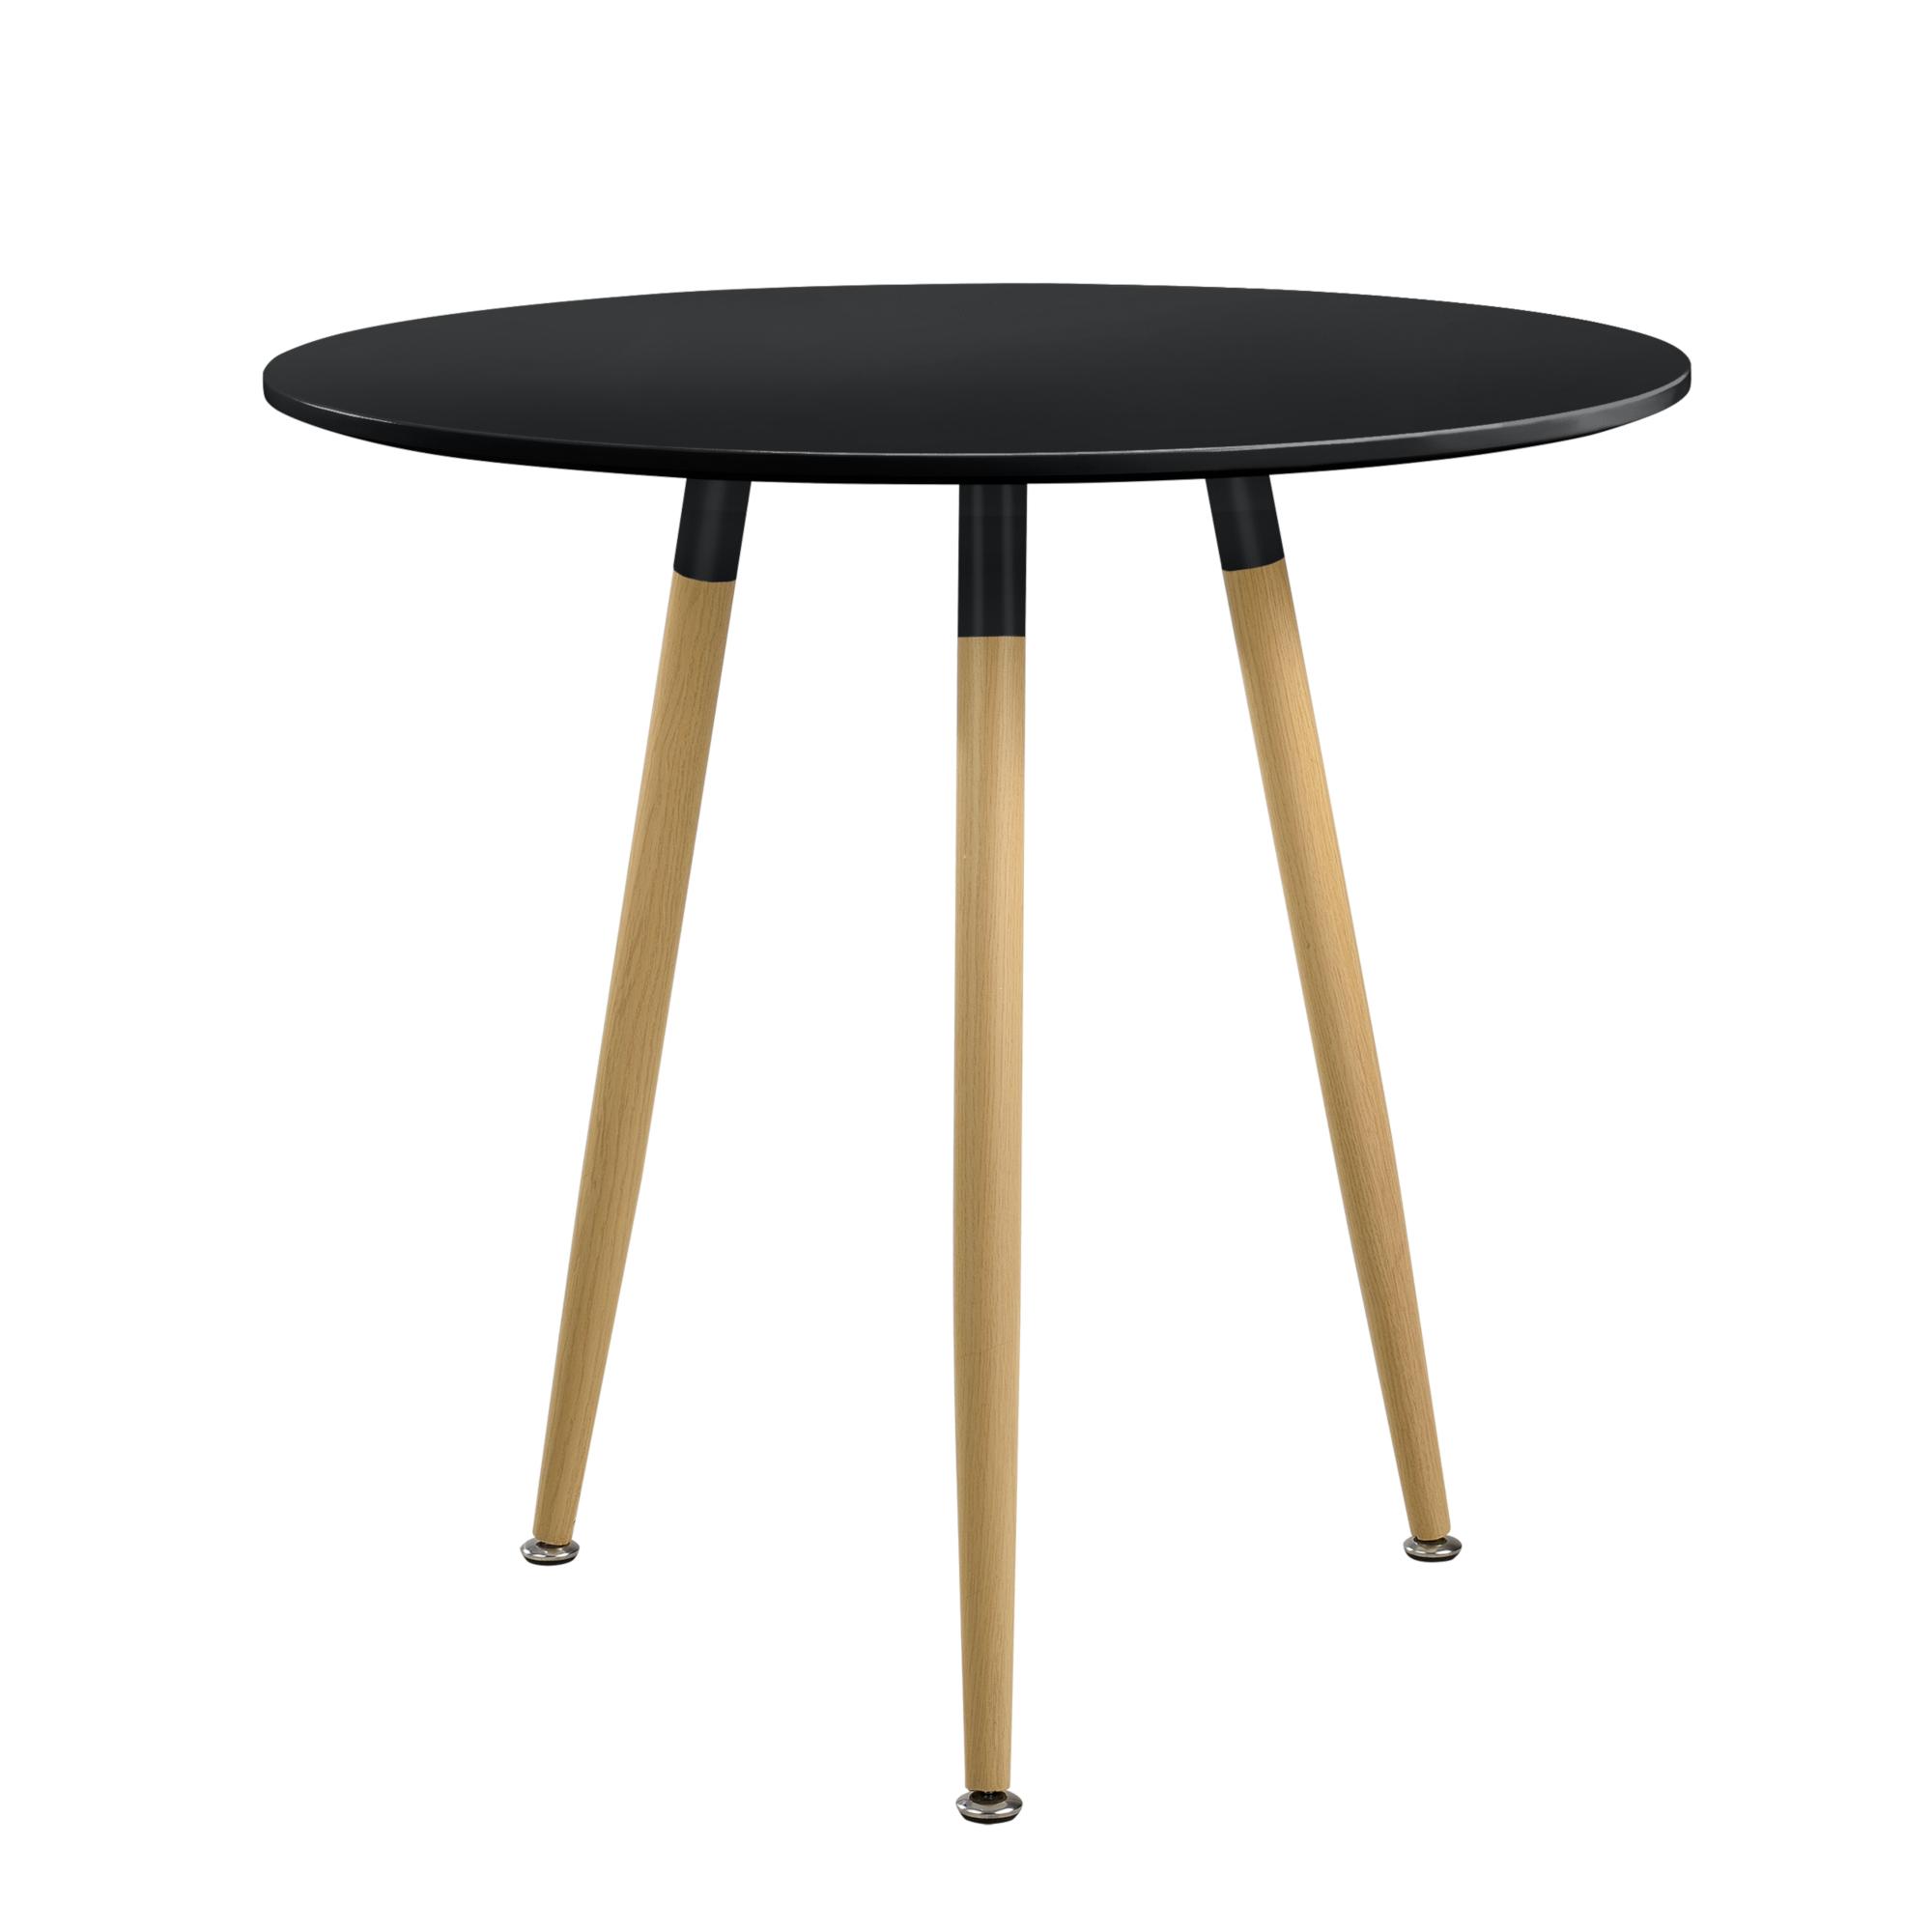 En Casa Table A Manger Ronde Noire H 75cmxo80cm Bois Design